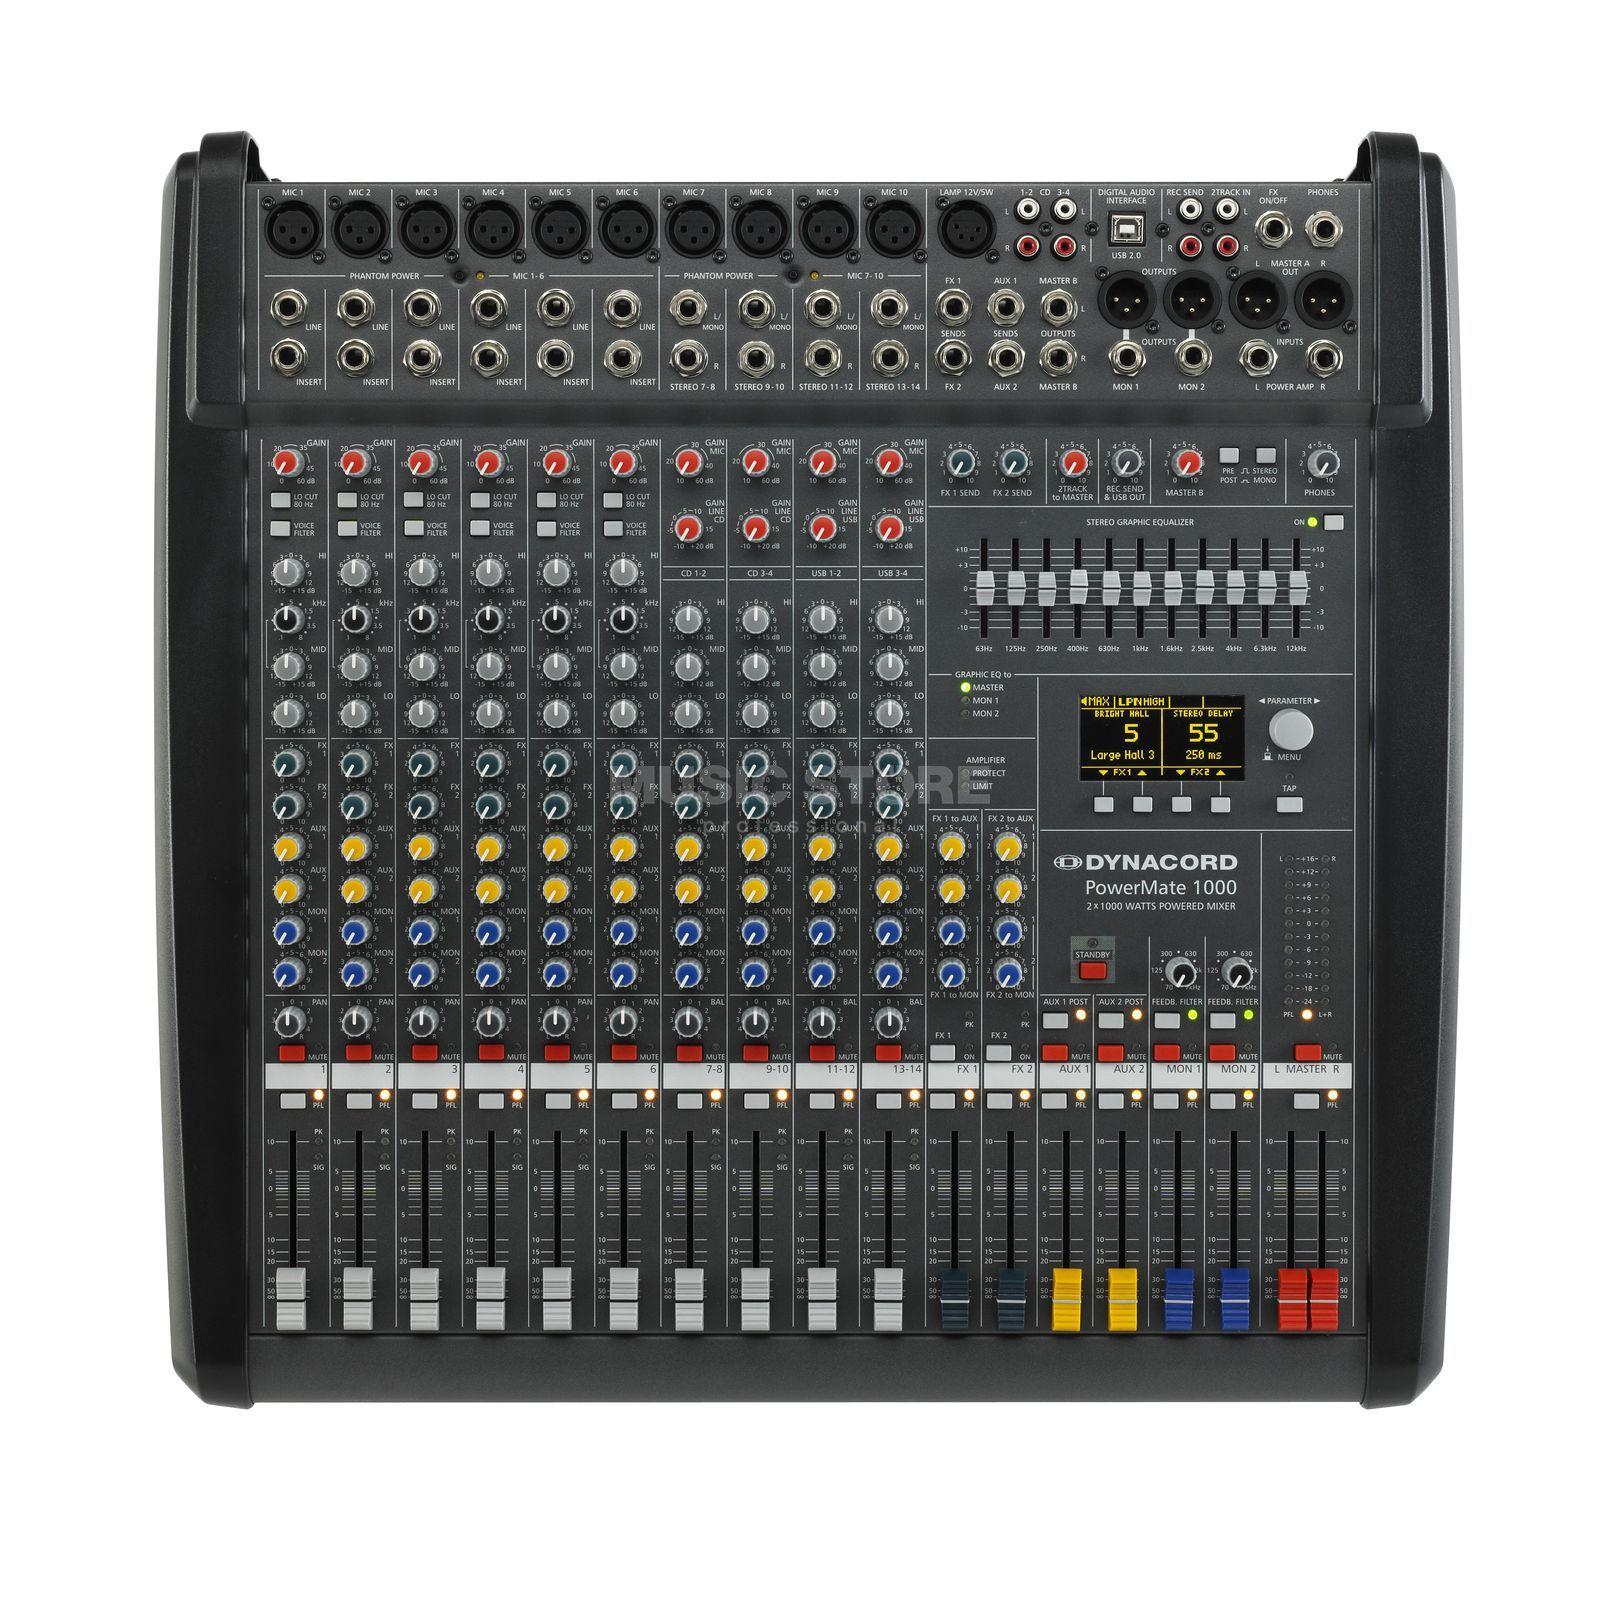 Dynacord powermate 1000 3 table de mixage amplifi e 2x 1000 w 4 ohms - Console de mixage amplifiee ...